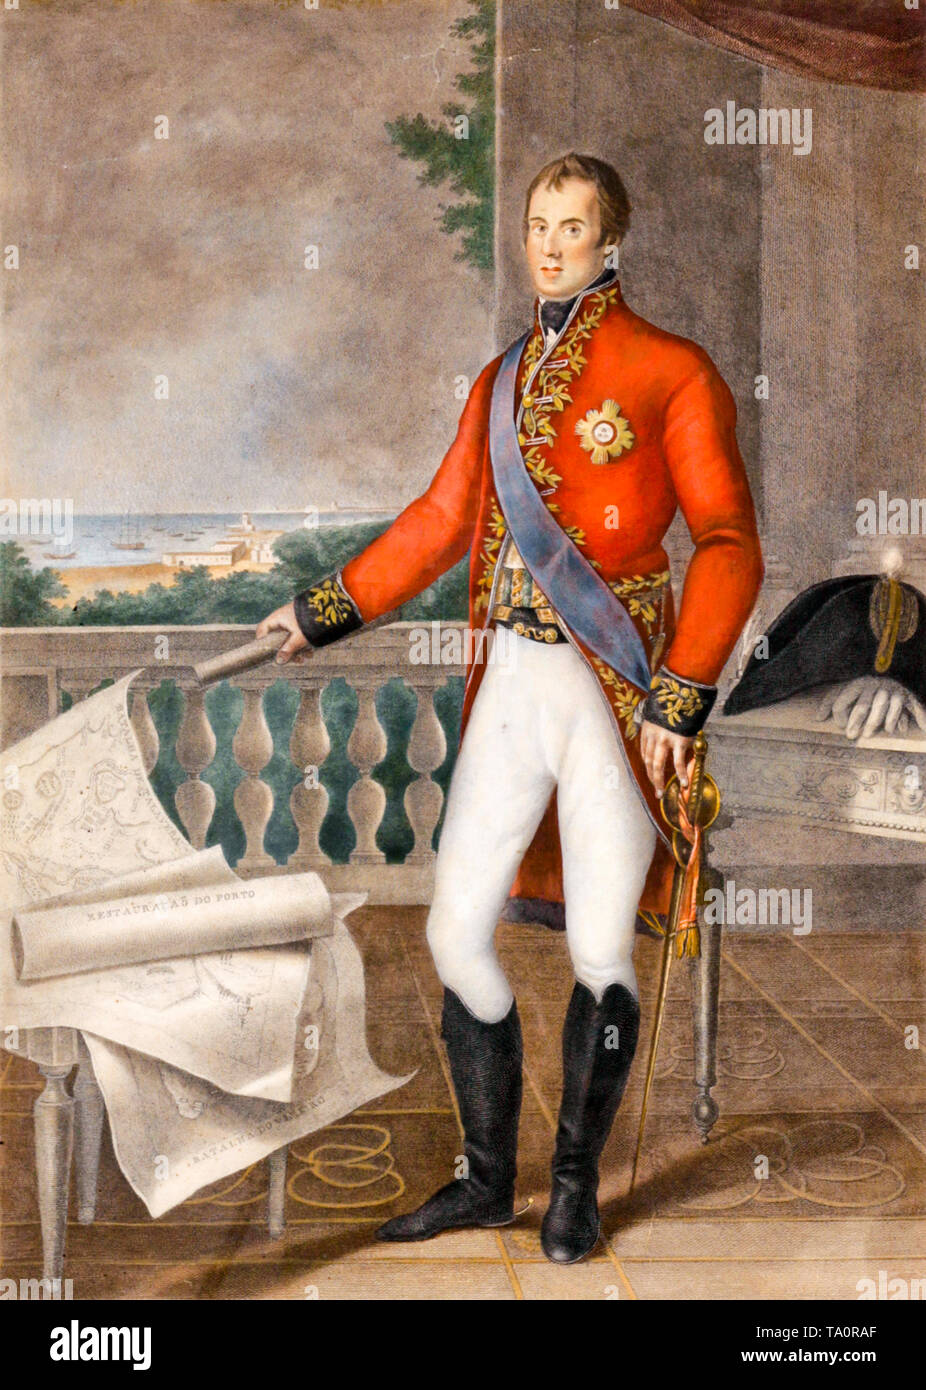 The Duke of Wellington, portrait in military uniform, engraving by Francesco Bartolozzi, c. 1810 - Stock Image